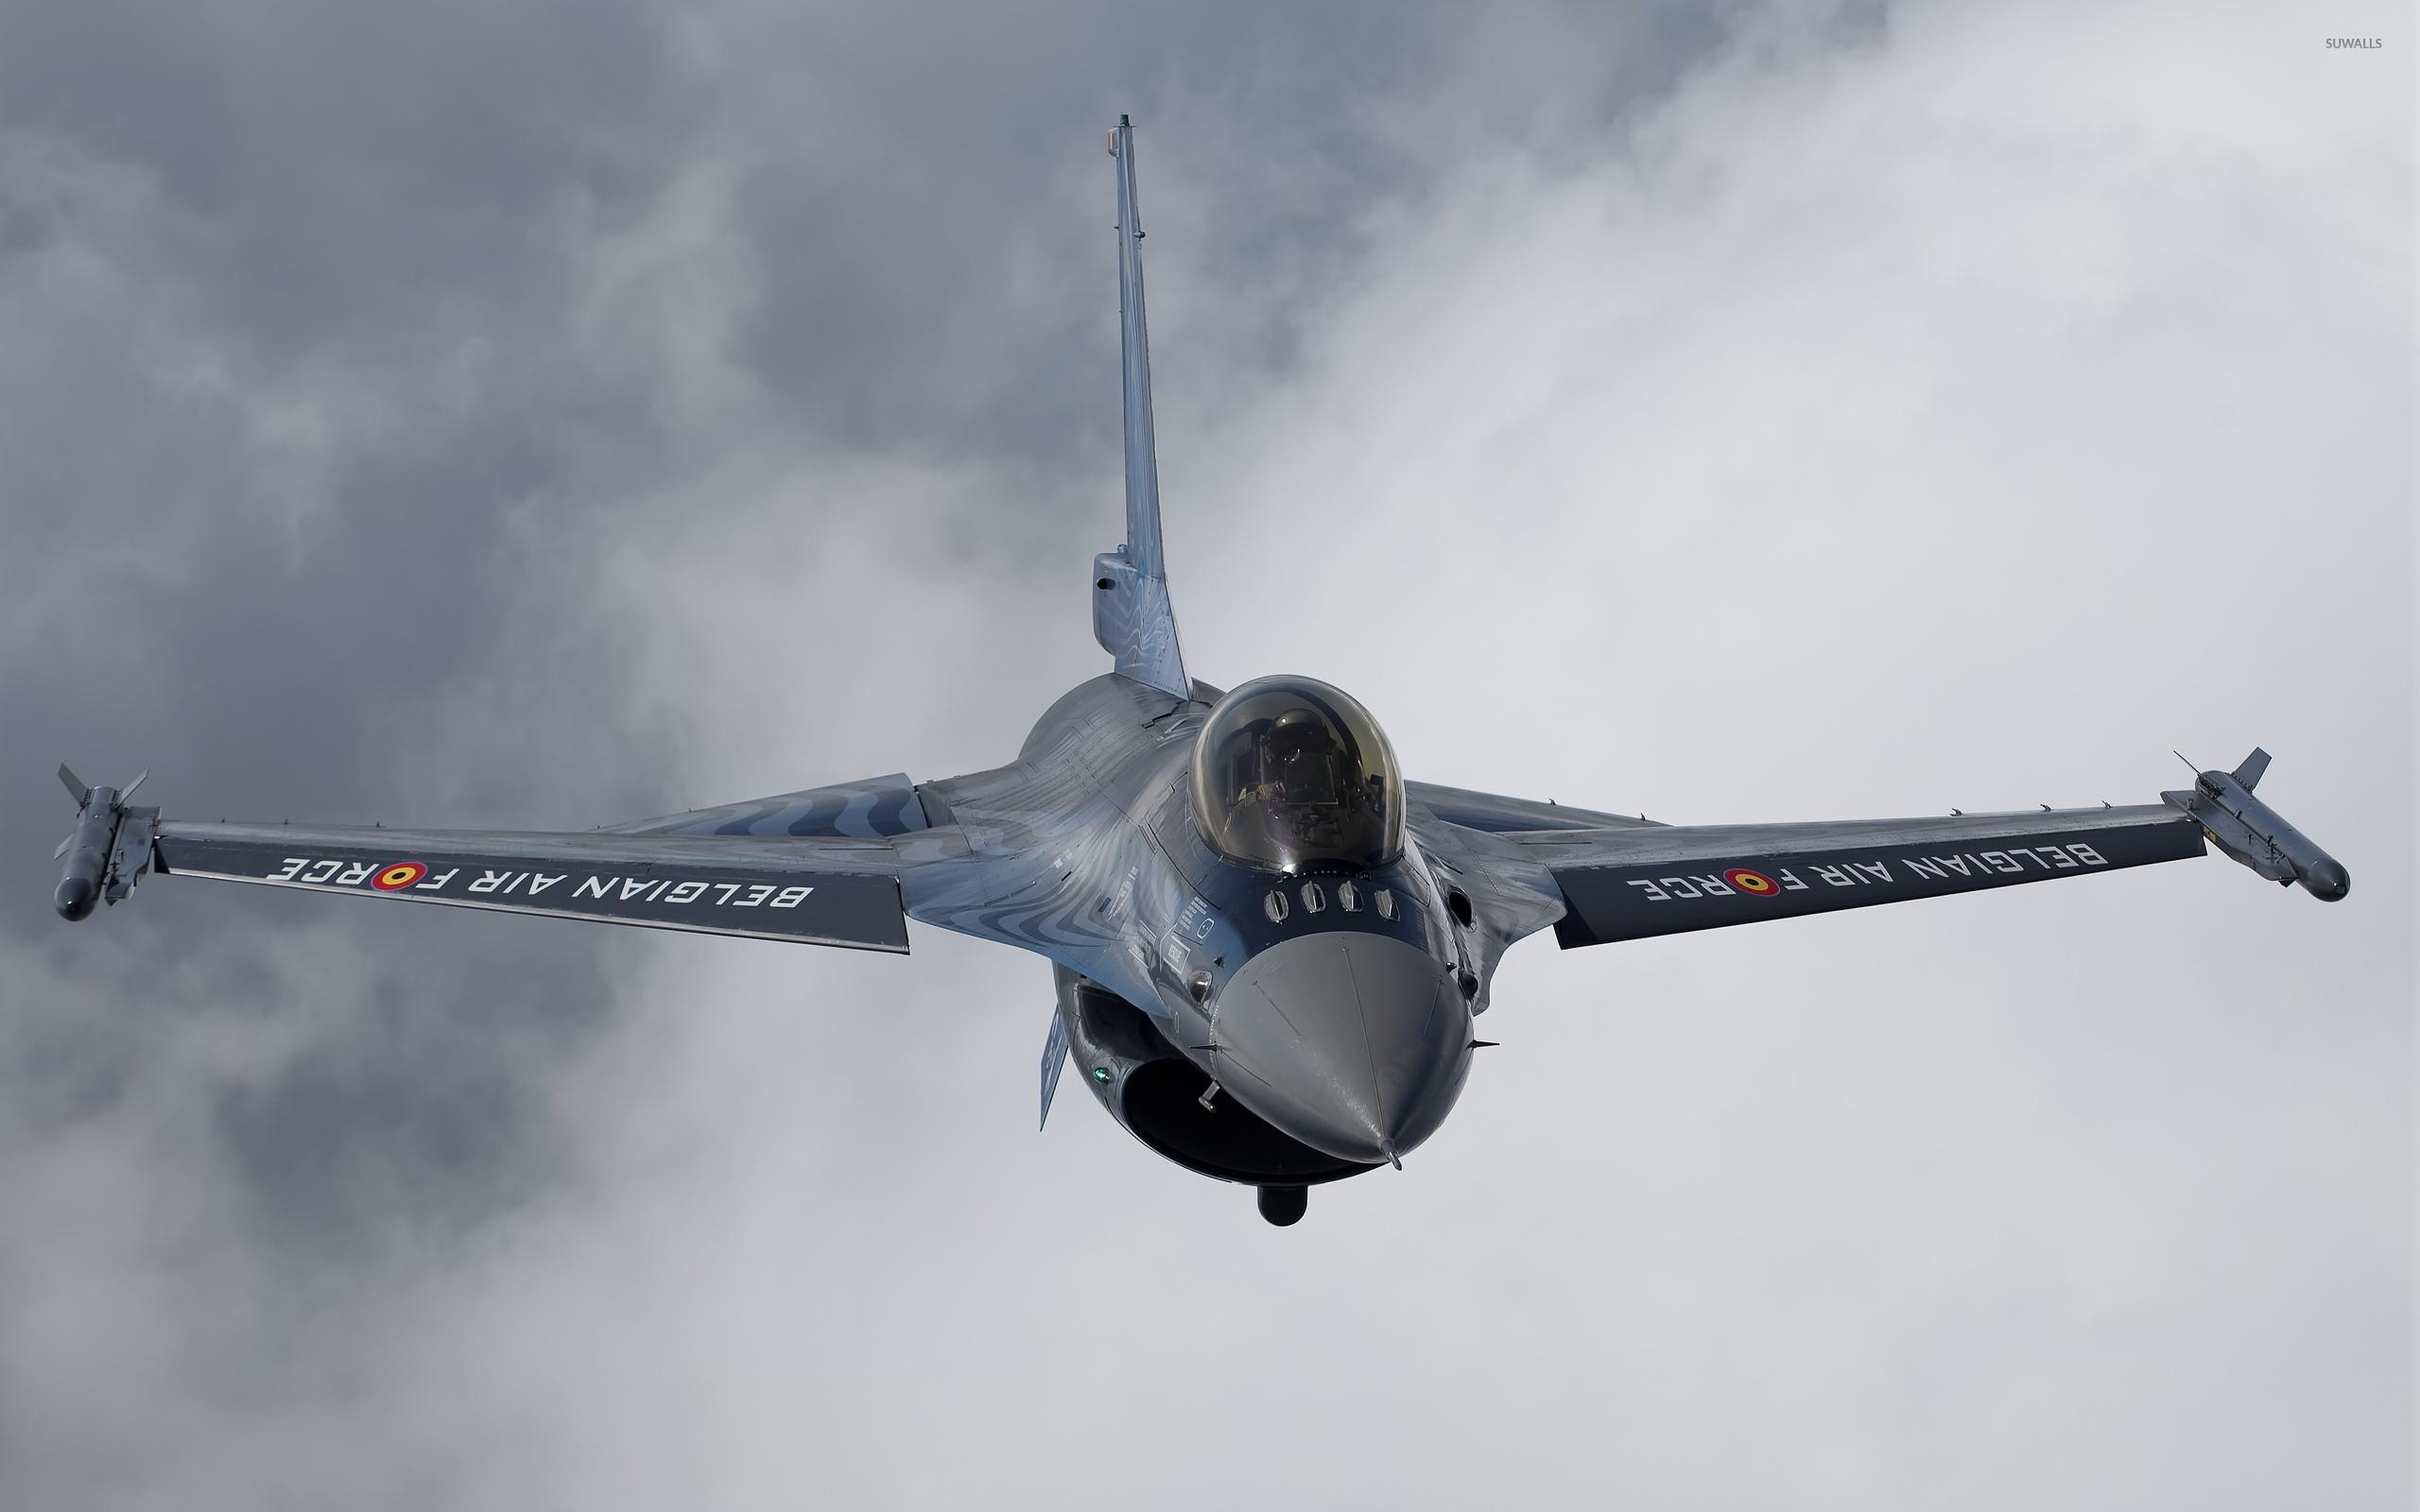 General Dynamics F-16 Fighting Falcon [22] Wallpaper